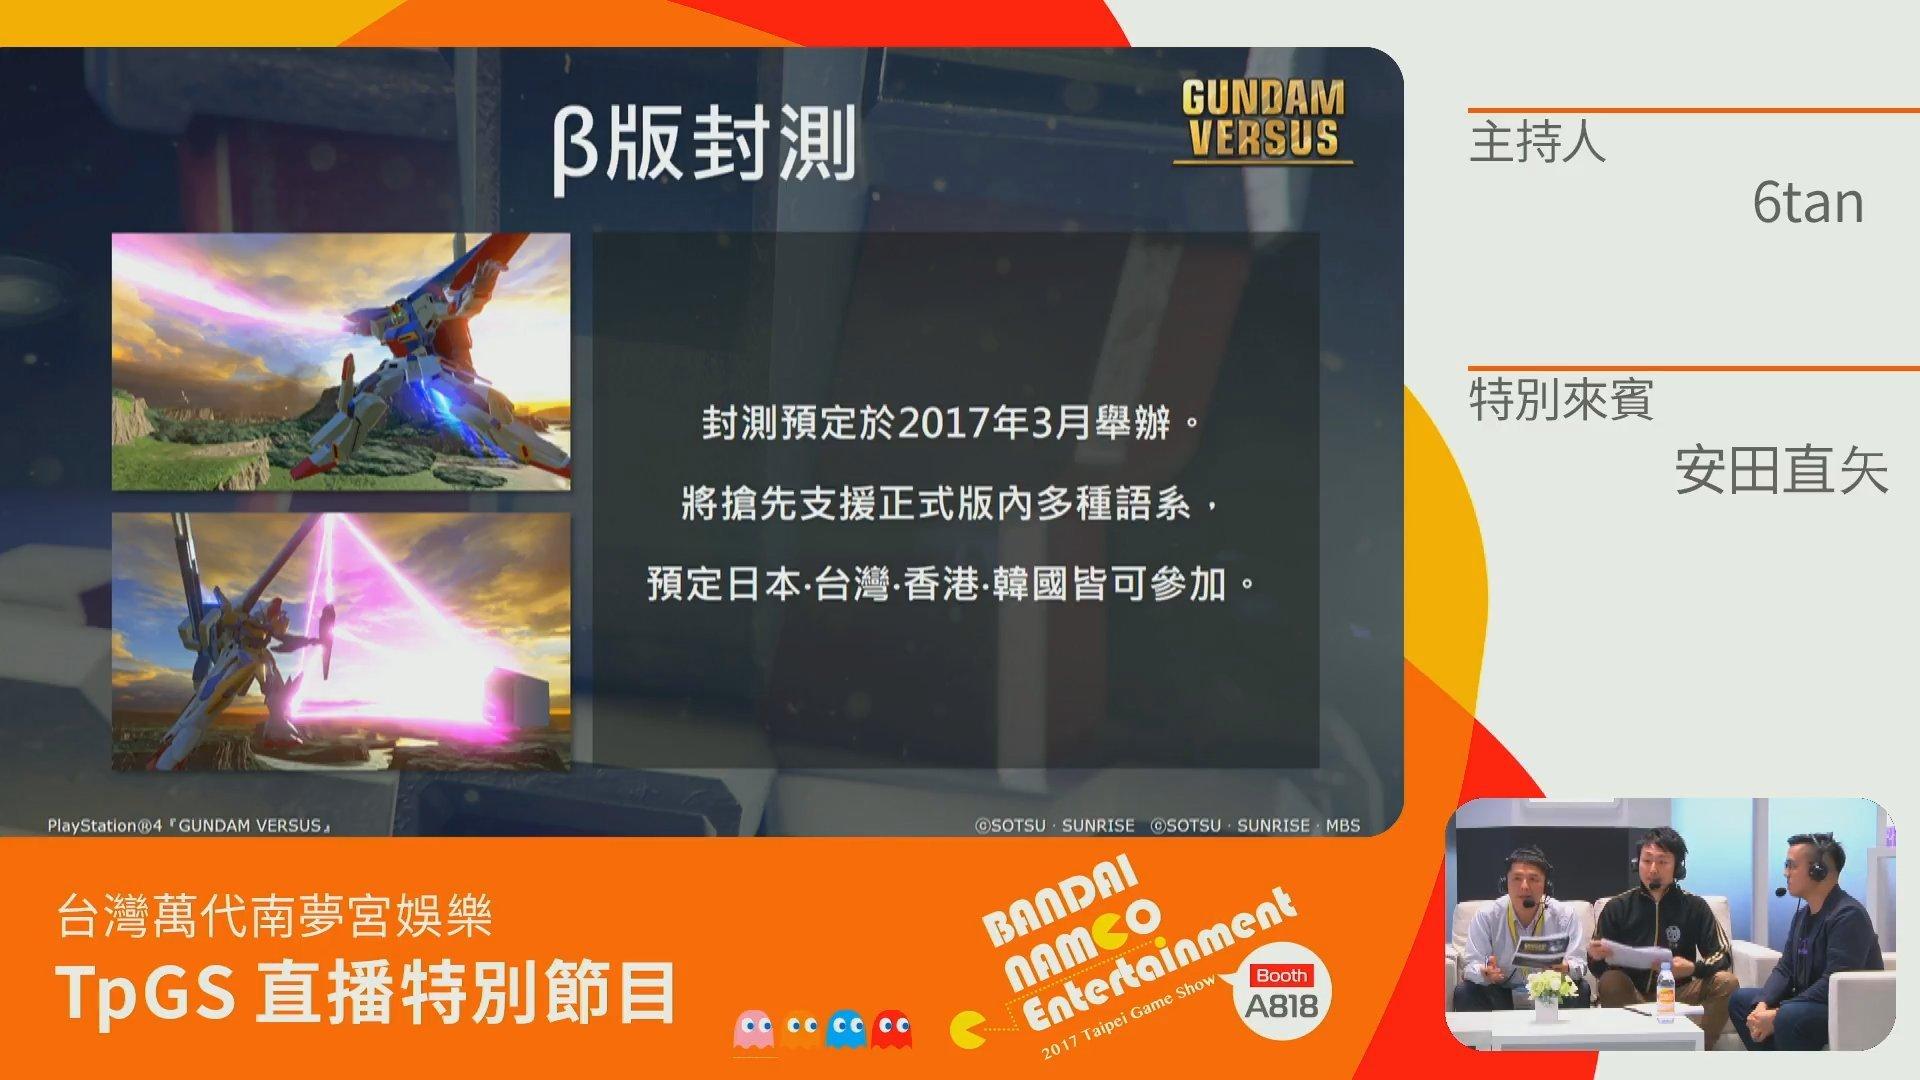 www.youku.com_youku.com/v_show/id_xmjq4mdm1mjk2na==.html 视频截图